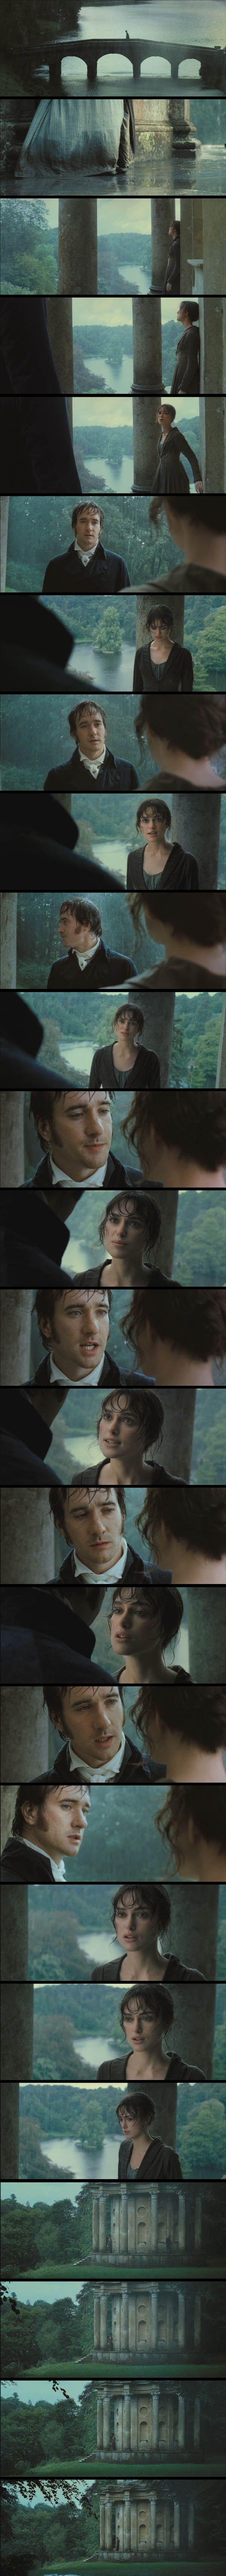 Darcy's first proposal - at the Temple of Apollo (Stourhead Garden, Warminster, Wiltshire, England, UK) Pride & Prejudice (2005) #janeausten #joewright